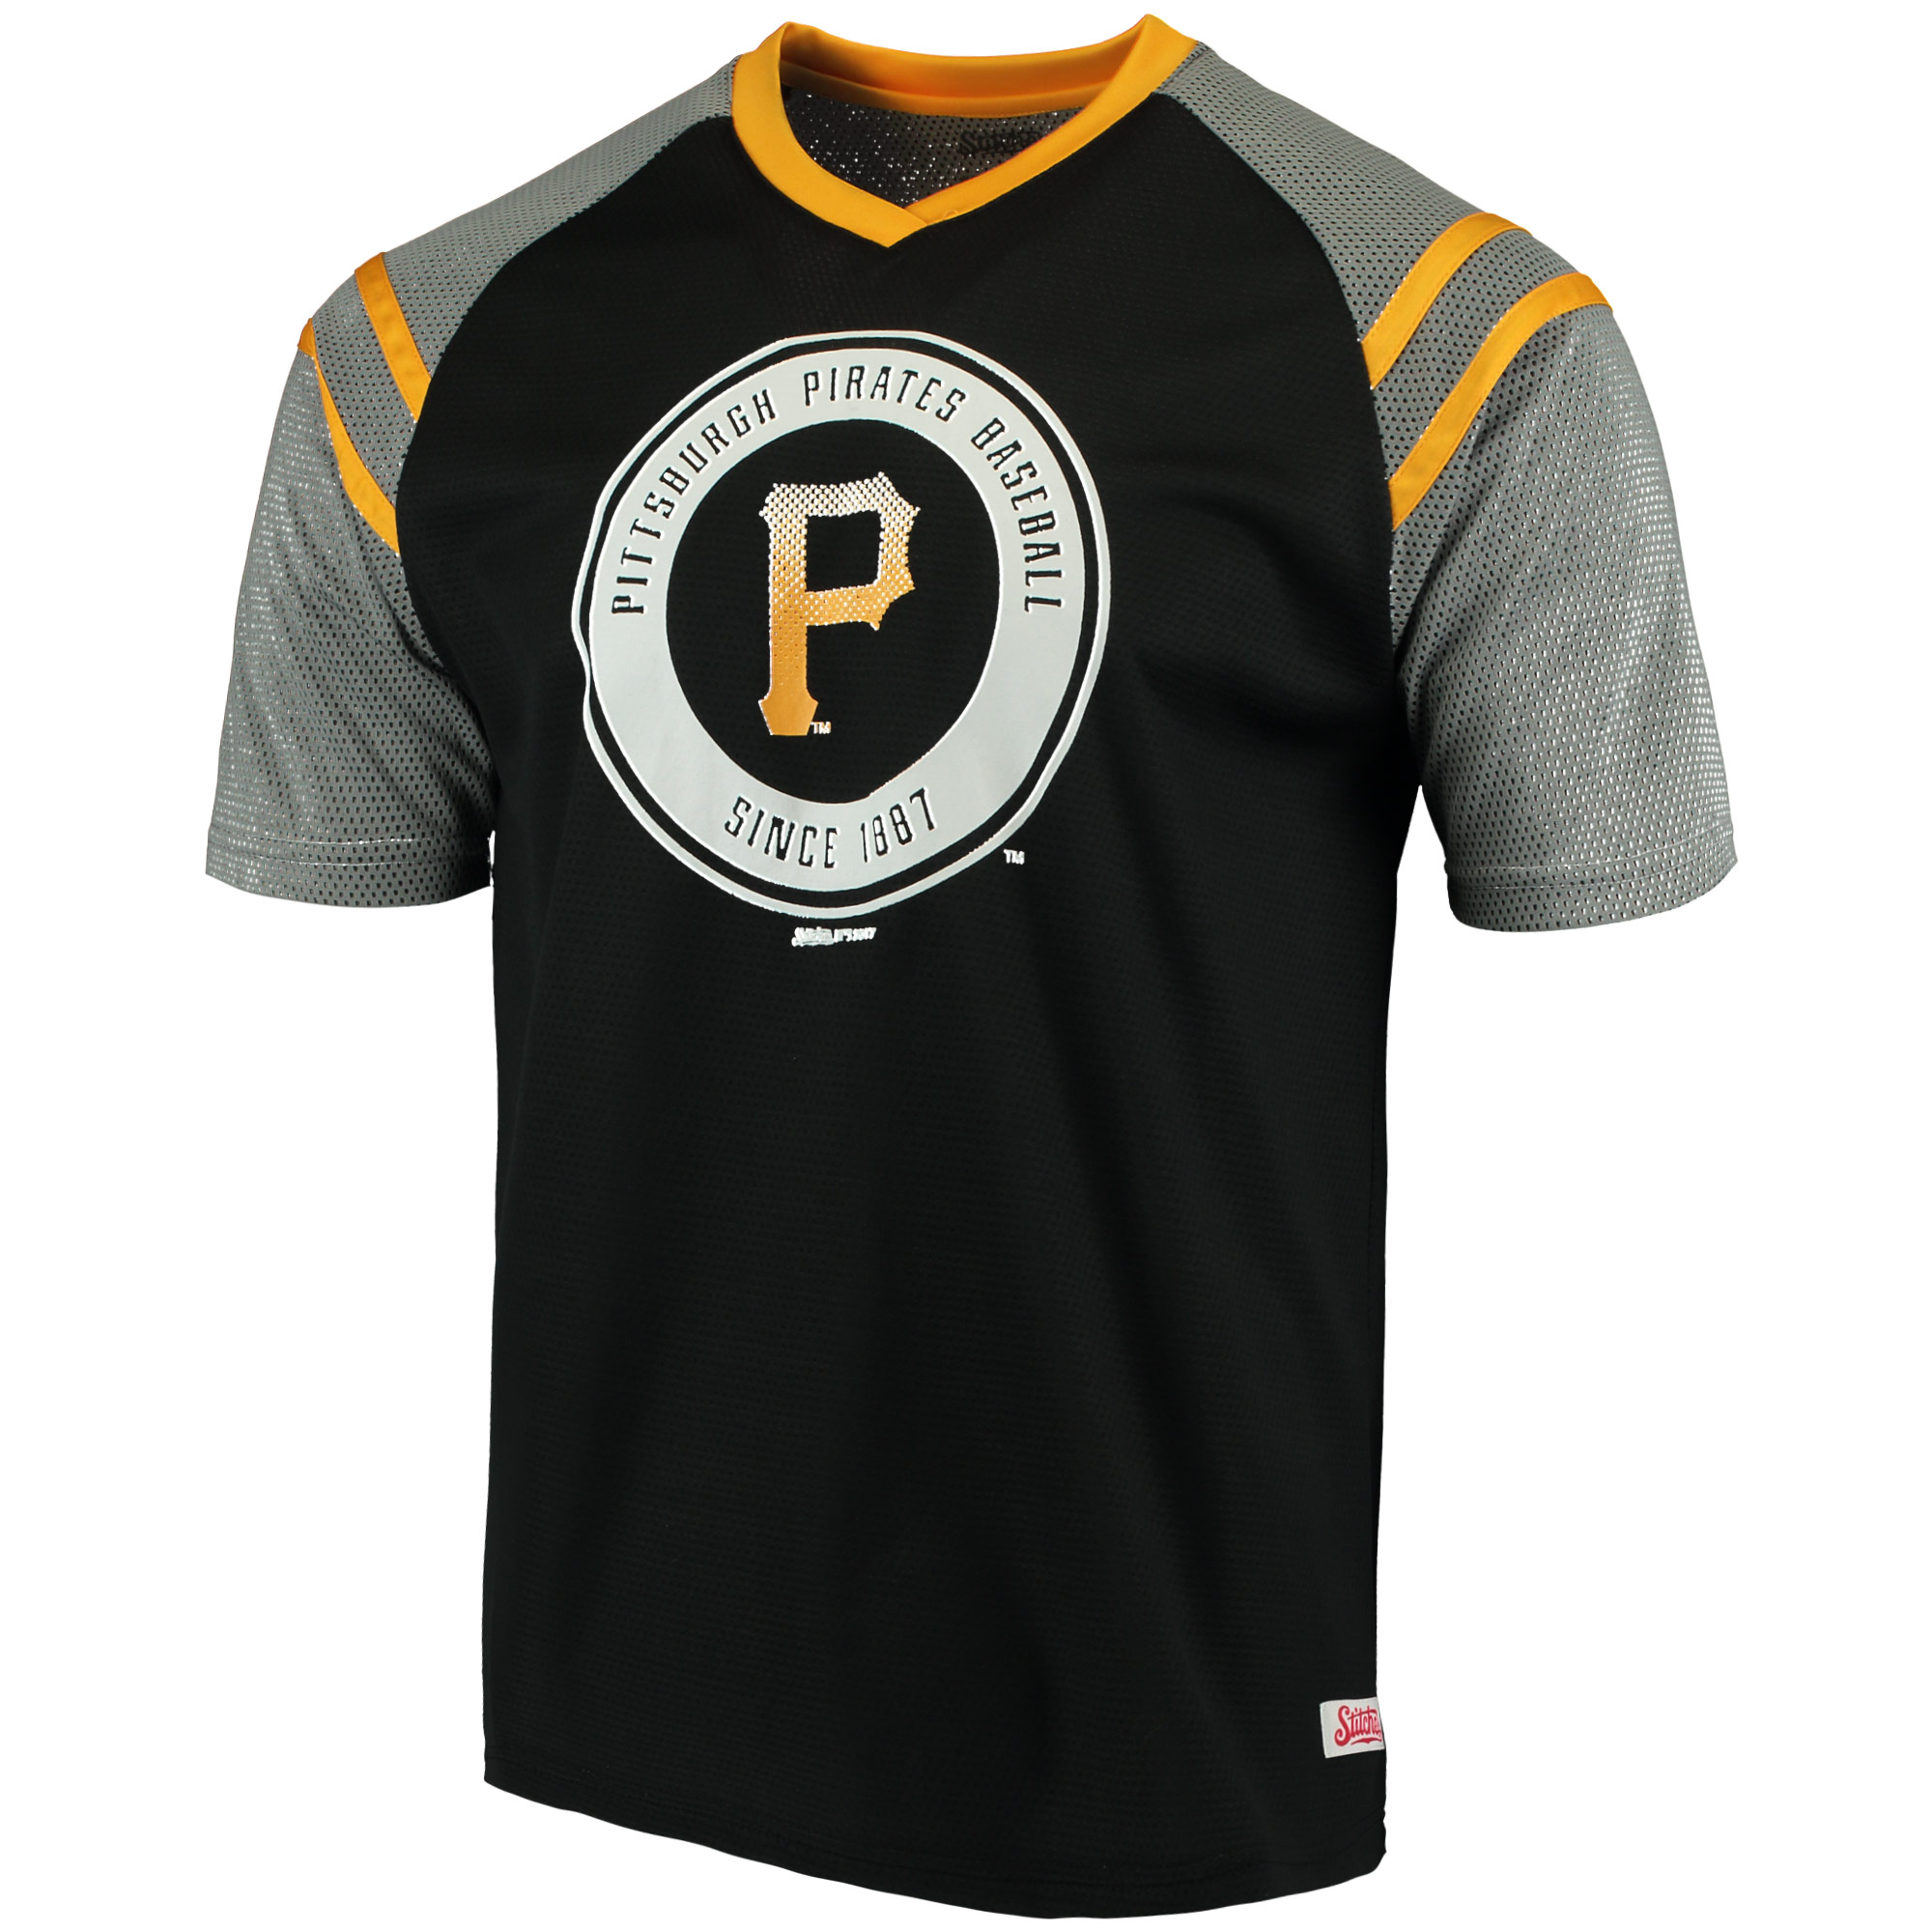 Pittsburgh Pirates Stitches V-Neck Mesh Jersey T-Shirt - Black/Gold